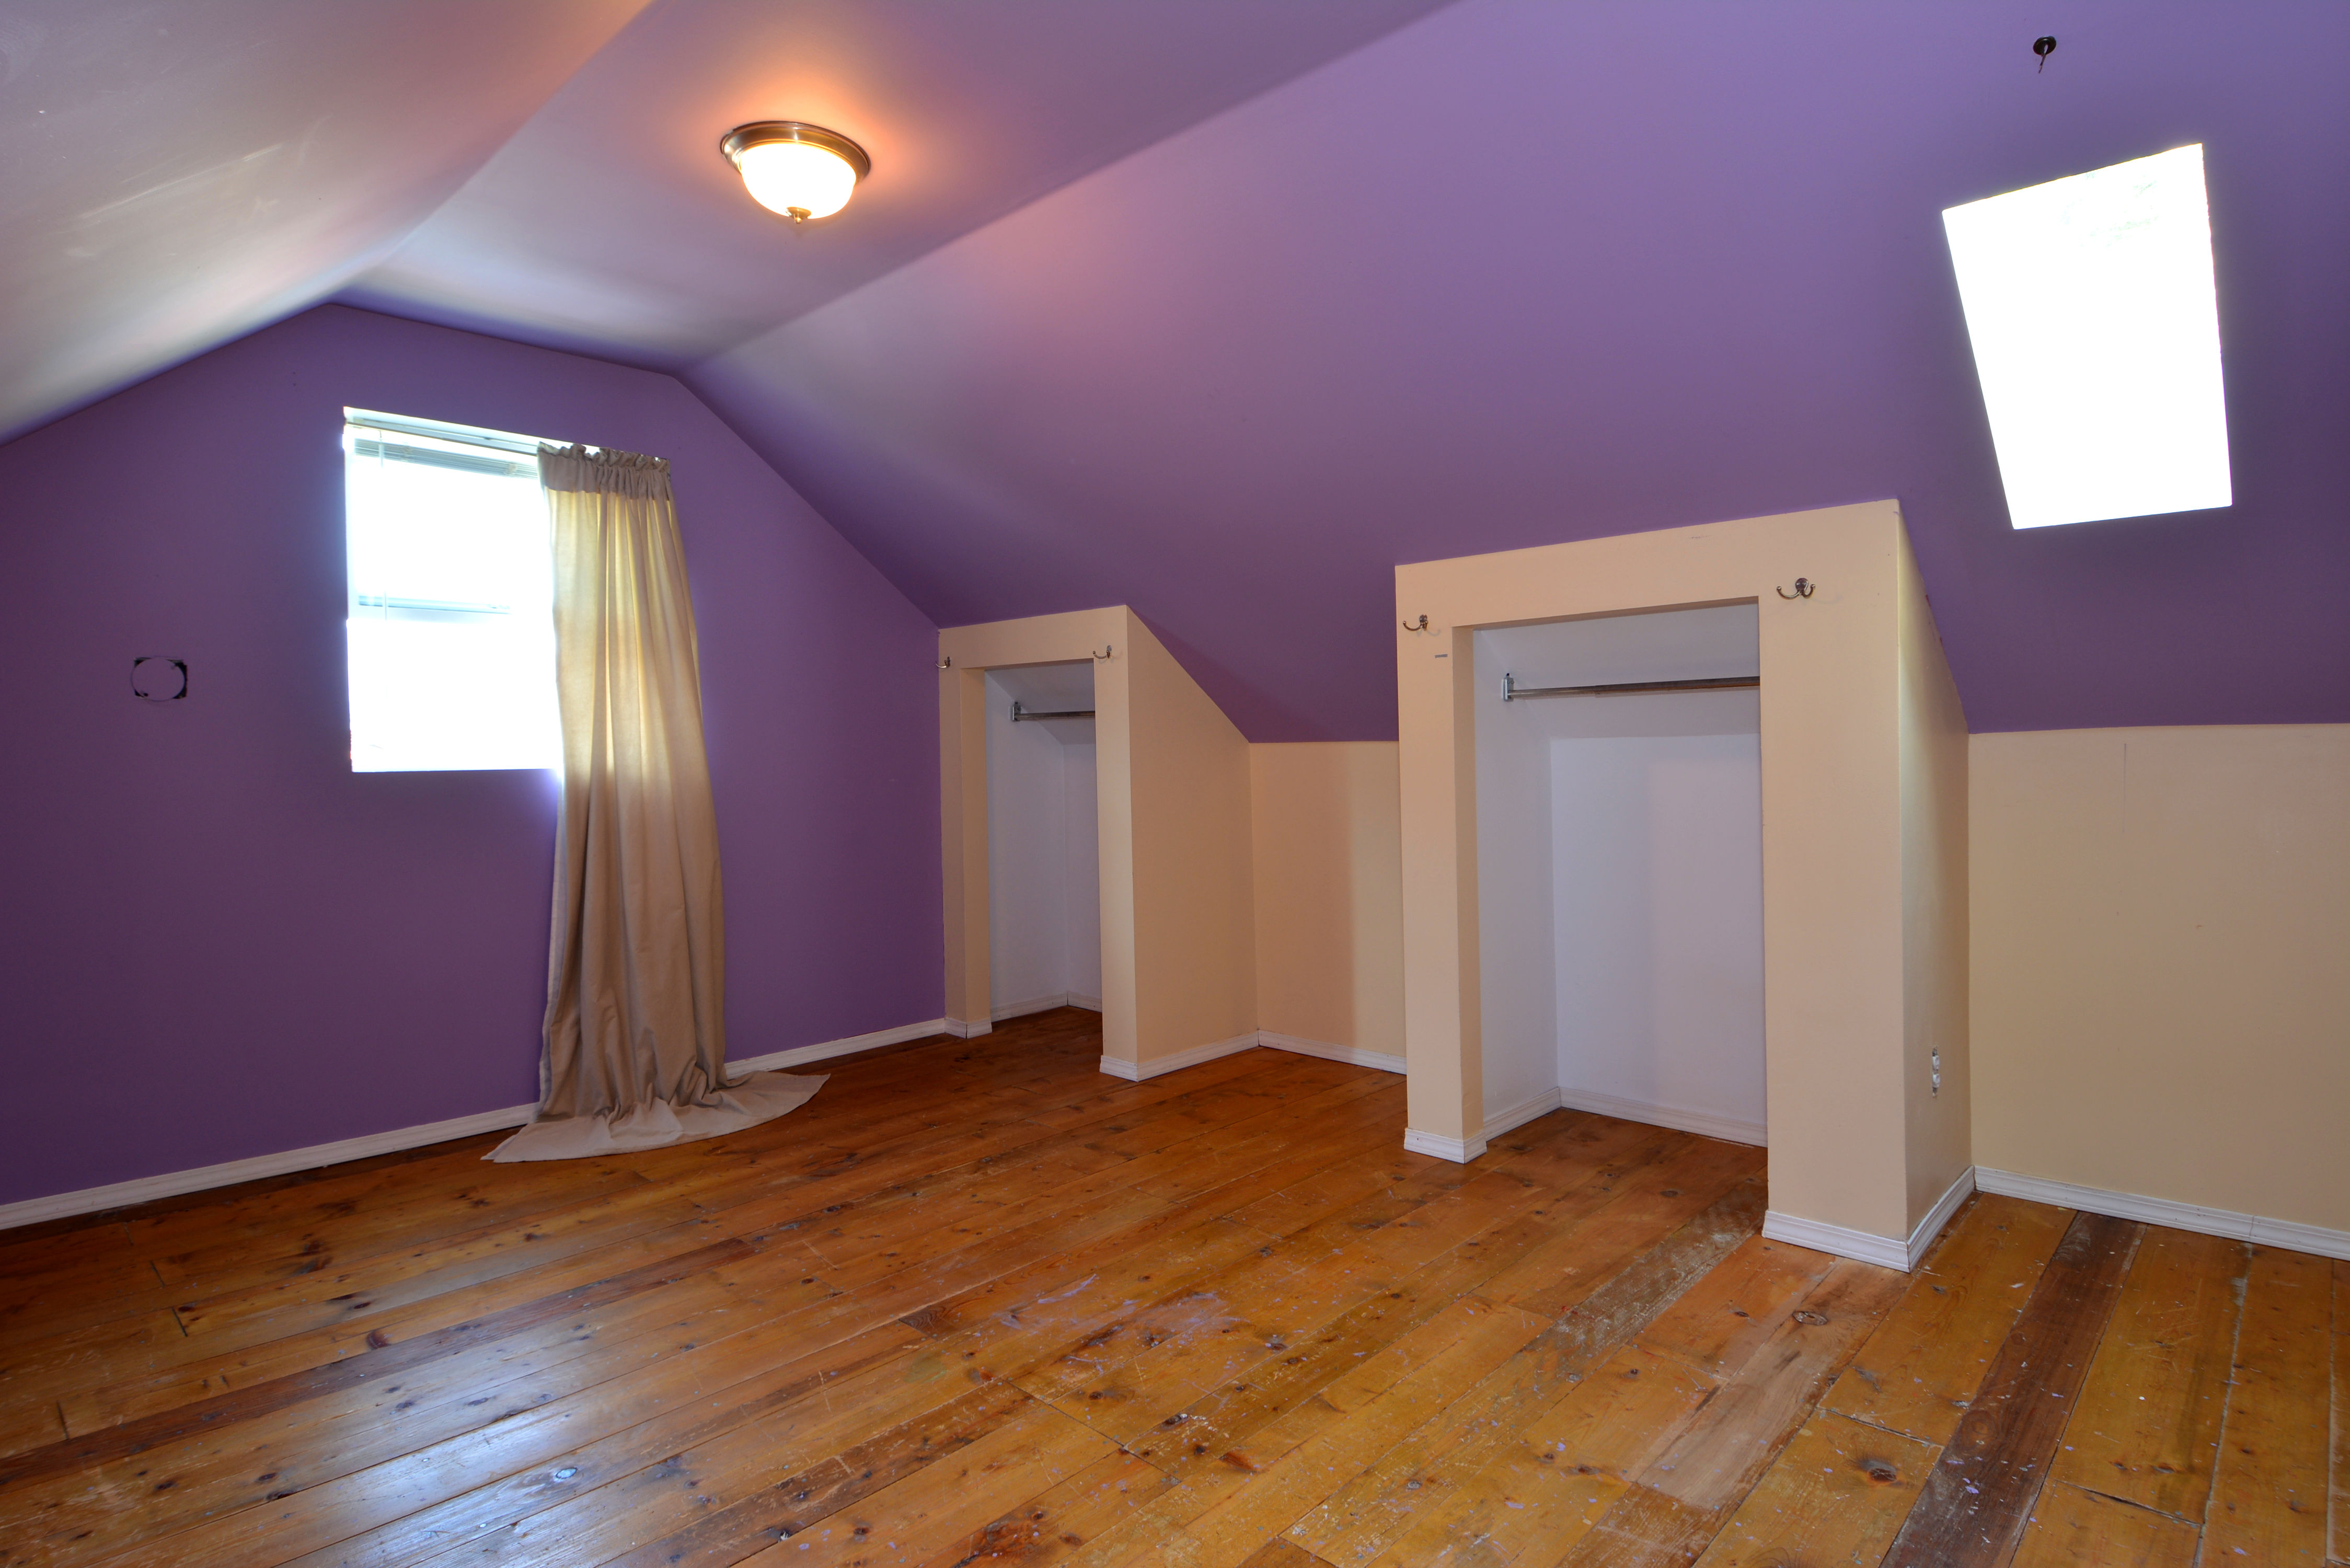 Upstairs Bedroom: 11'7 x 14'7